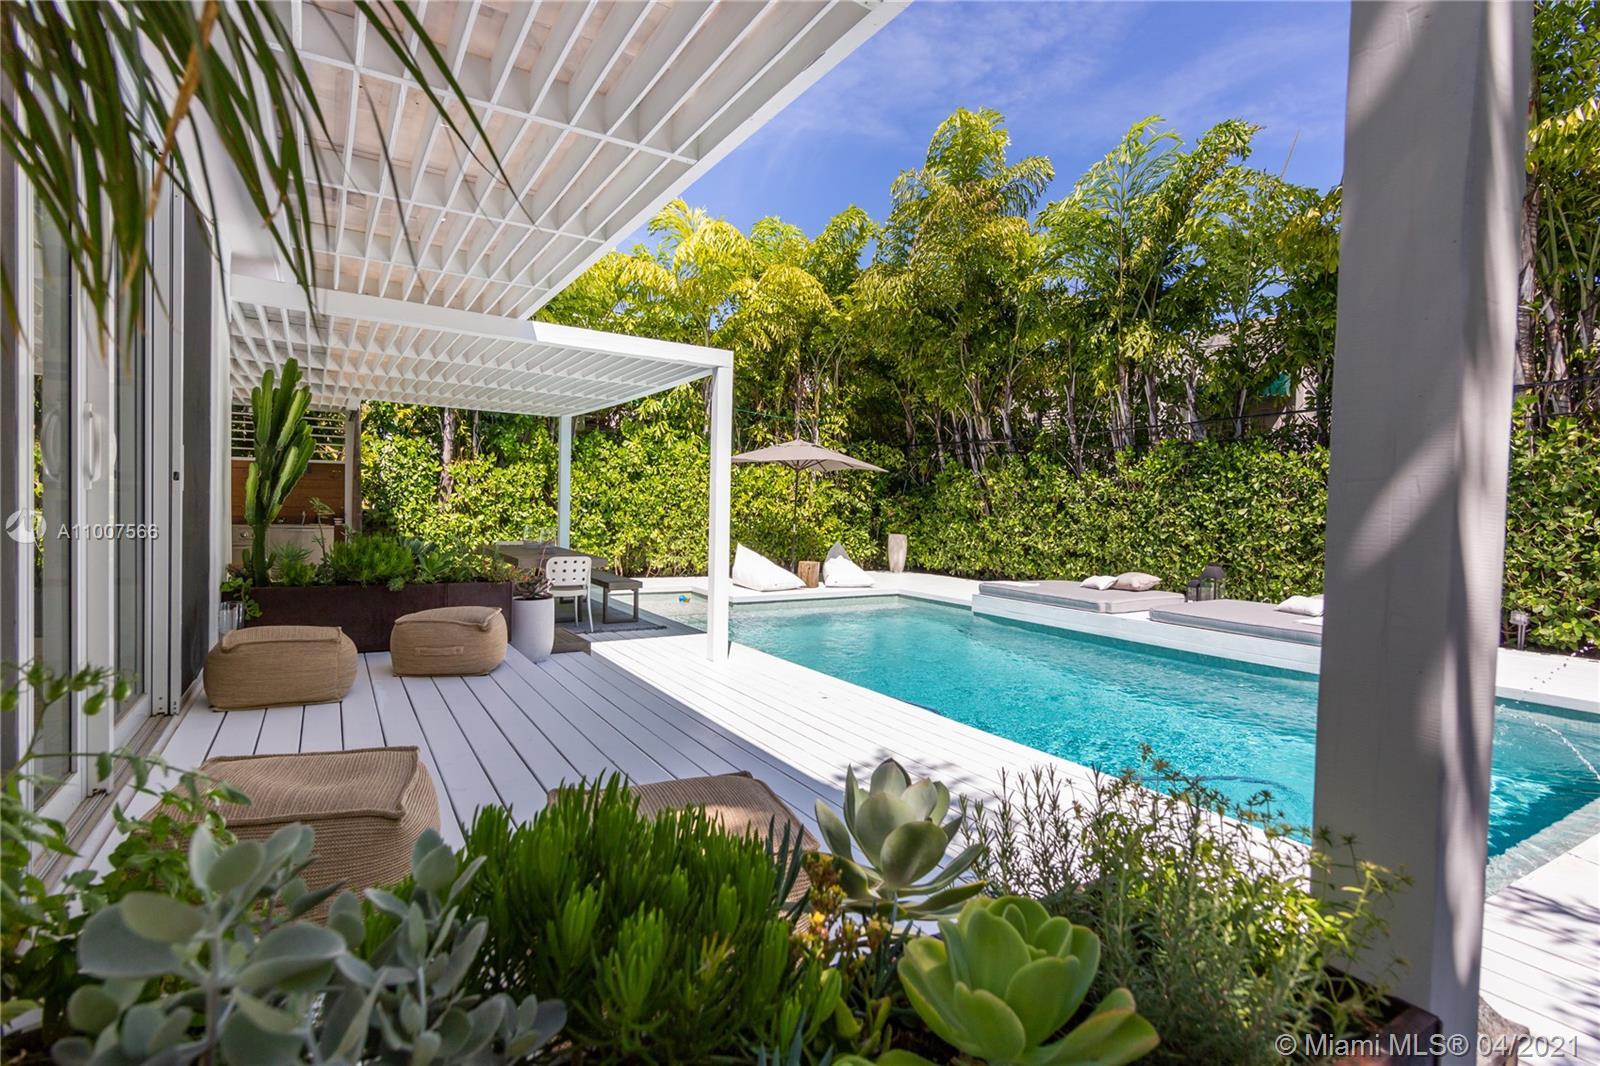 Sunset Lake - 3001 N Bay Rd, Miami Beach, FL 33140